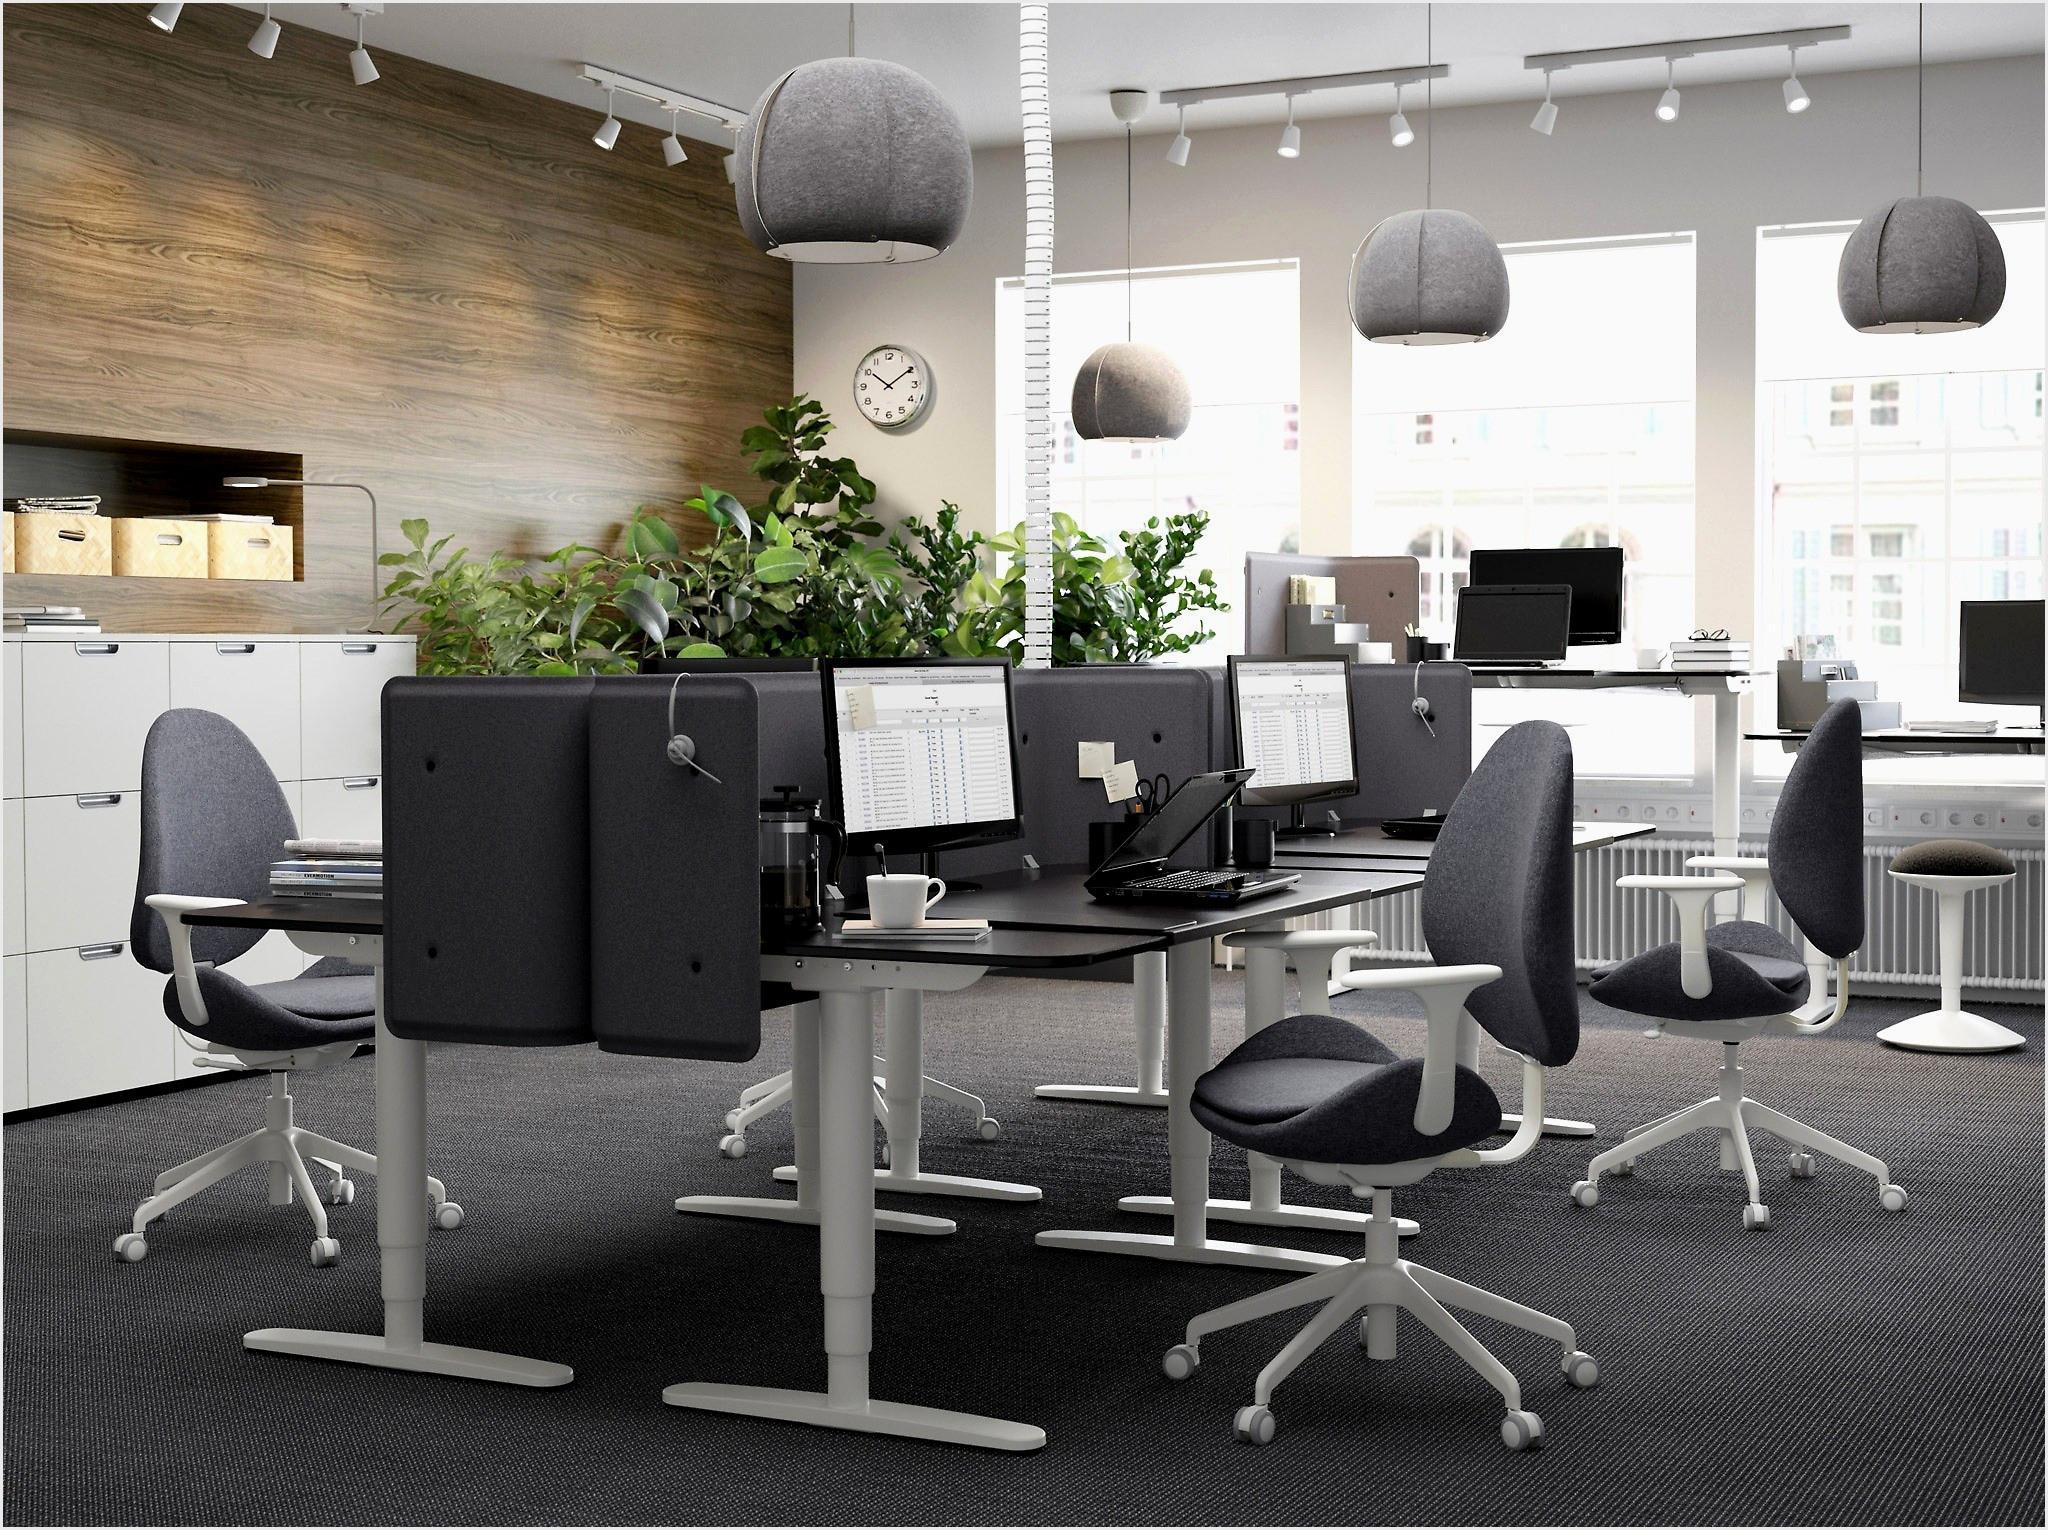 console meuble design genial console meuble conforama conforama meuble salon sejour conforama 0d of console meuble design